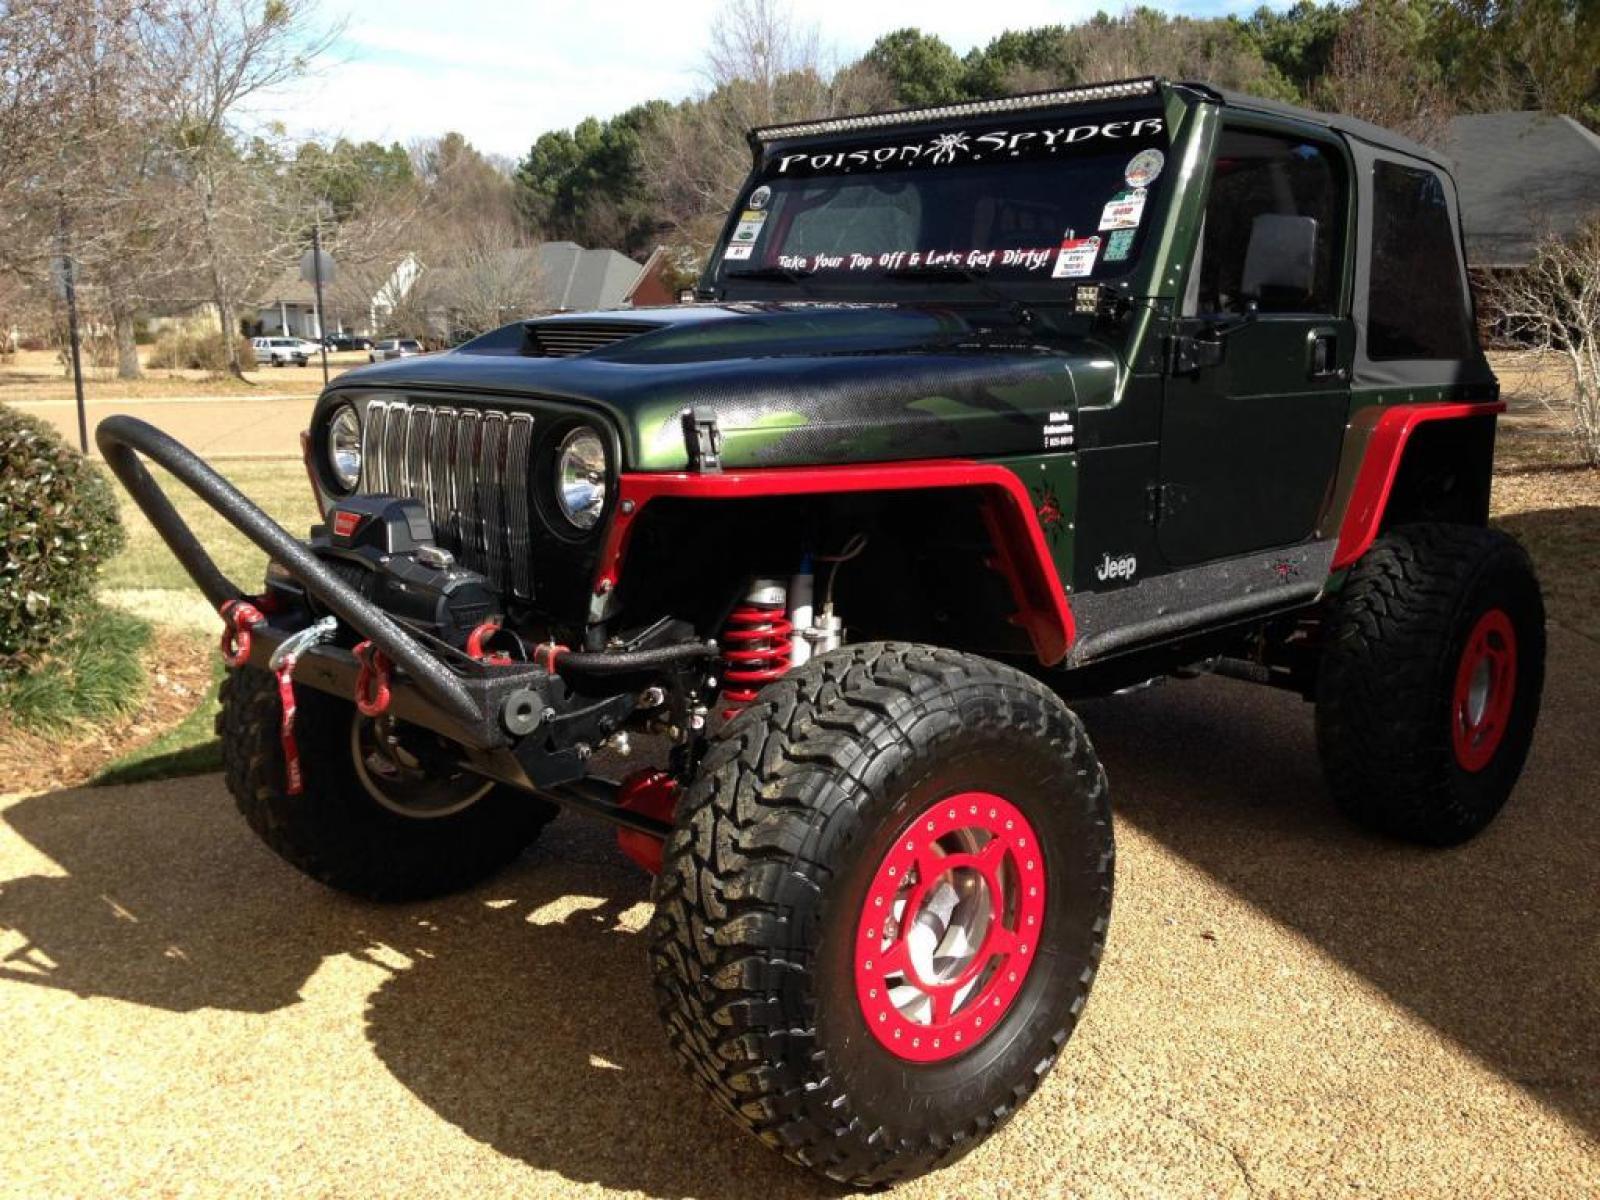 800 1024 1280 1600 origin 1998 jeep wrangler